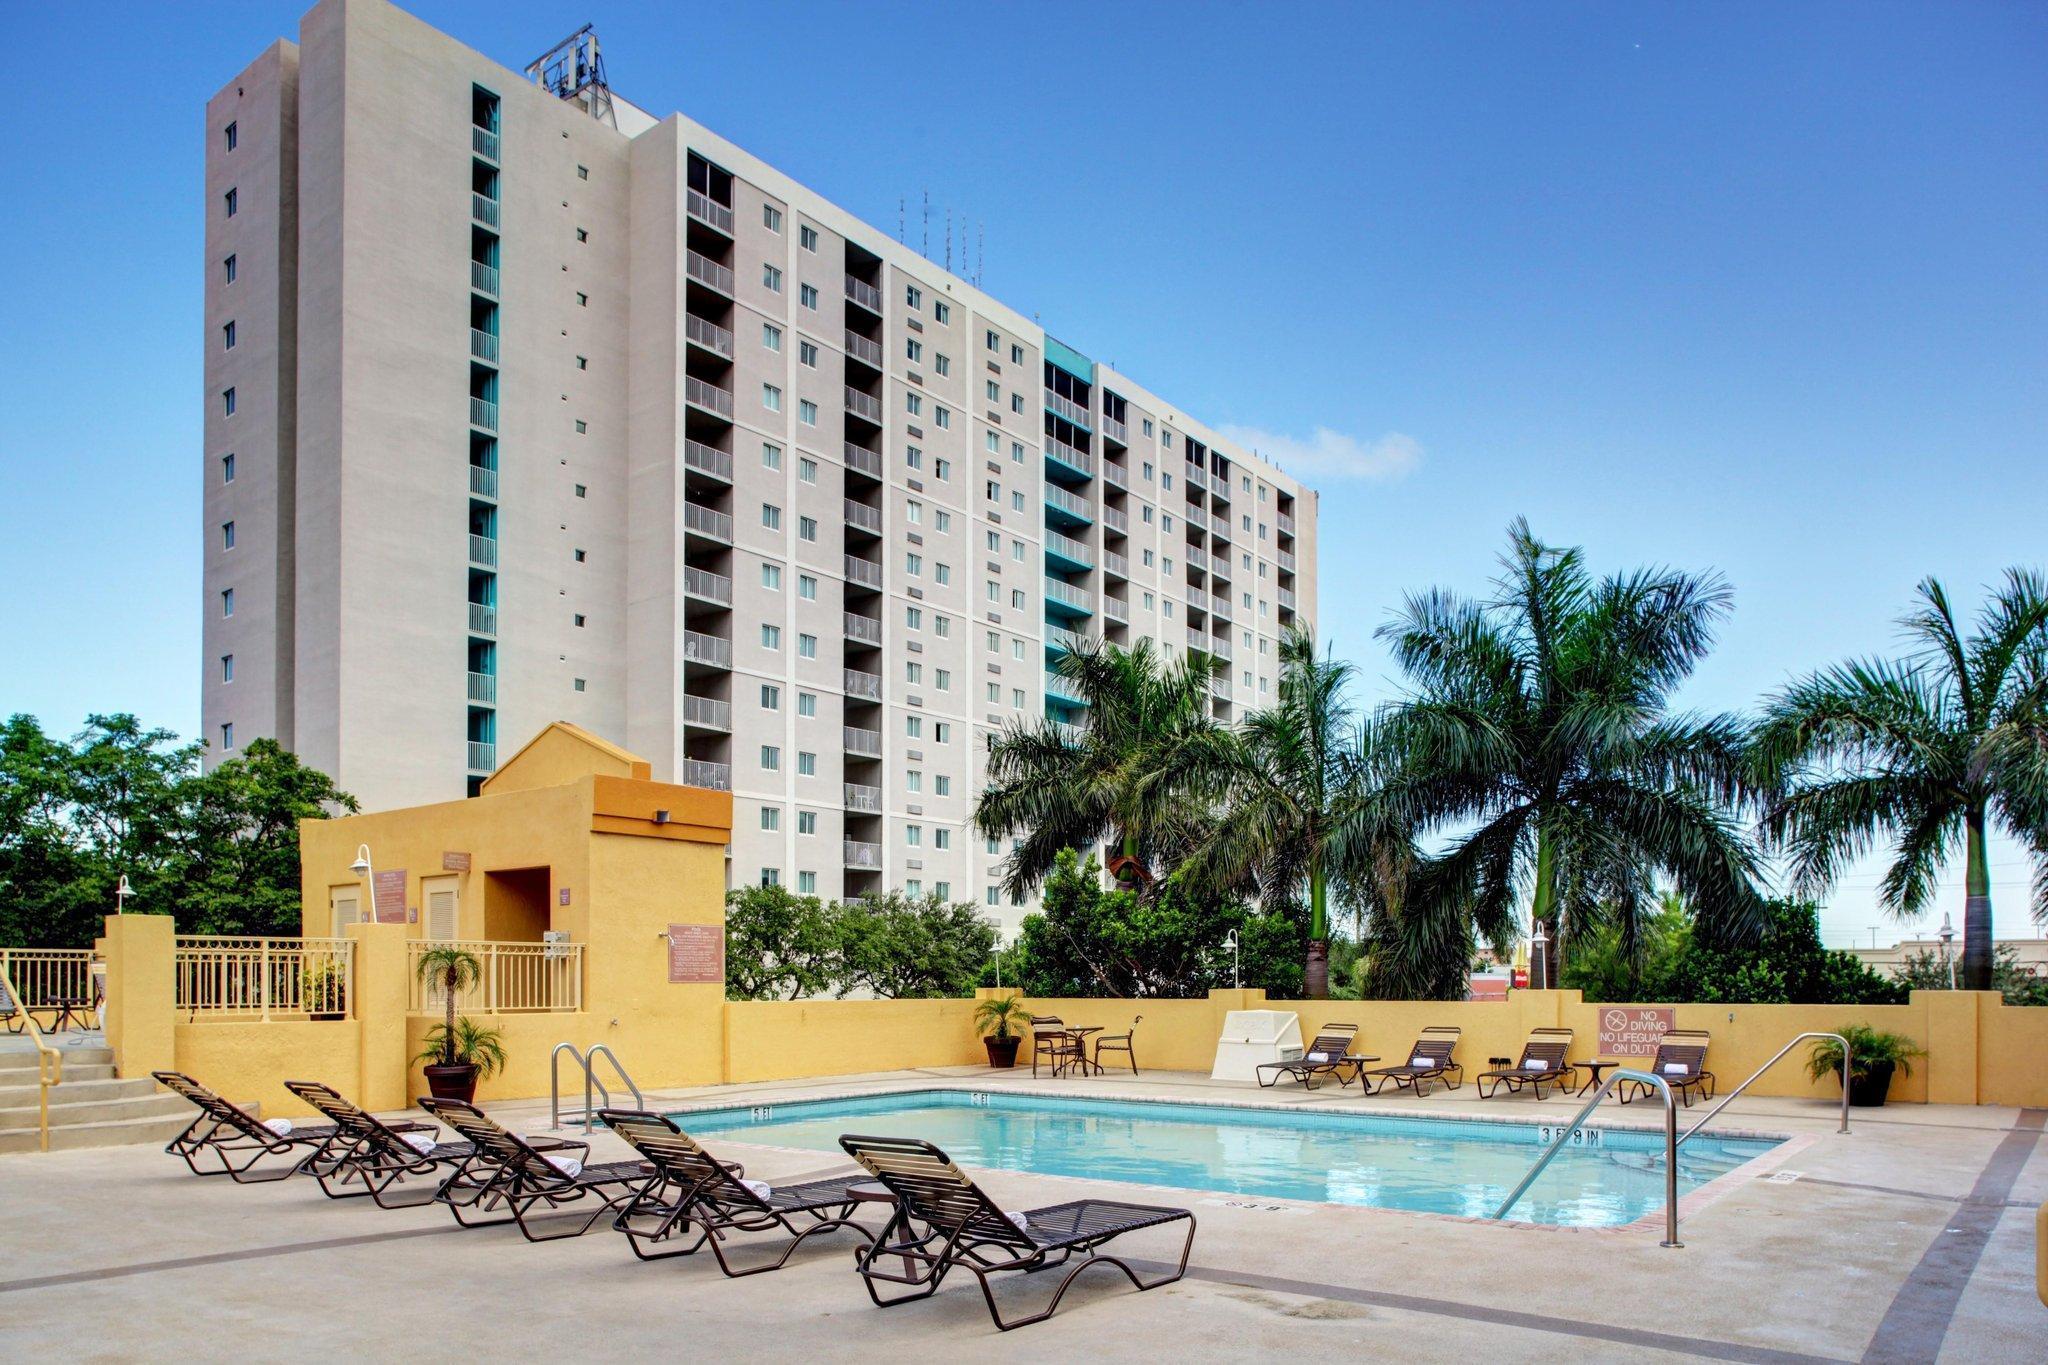 Hampton Inn And Suites Miami Airport South